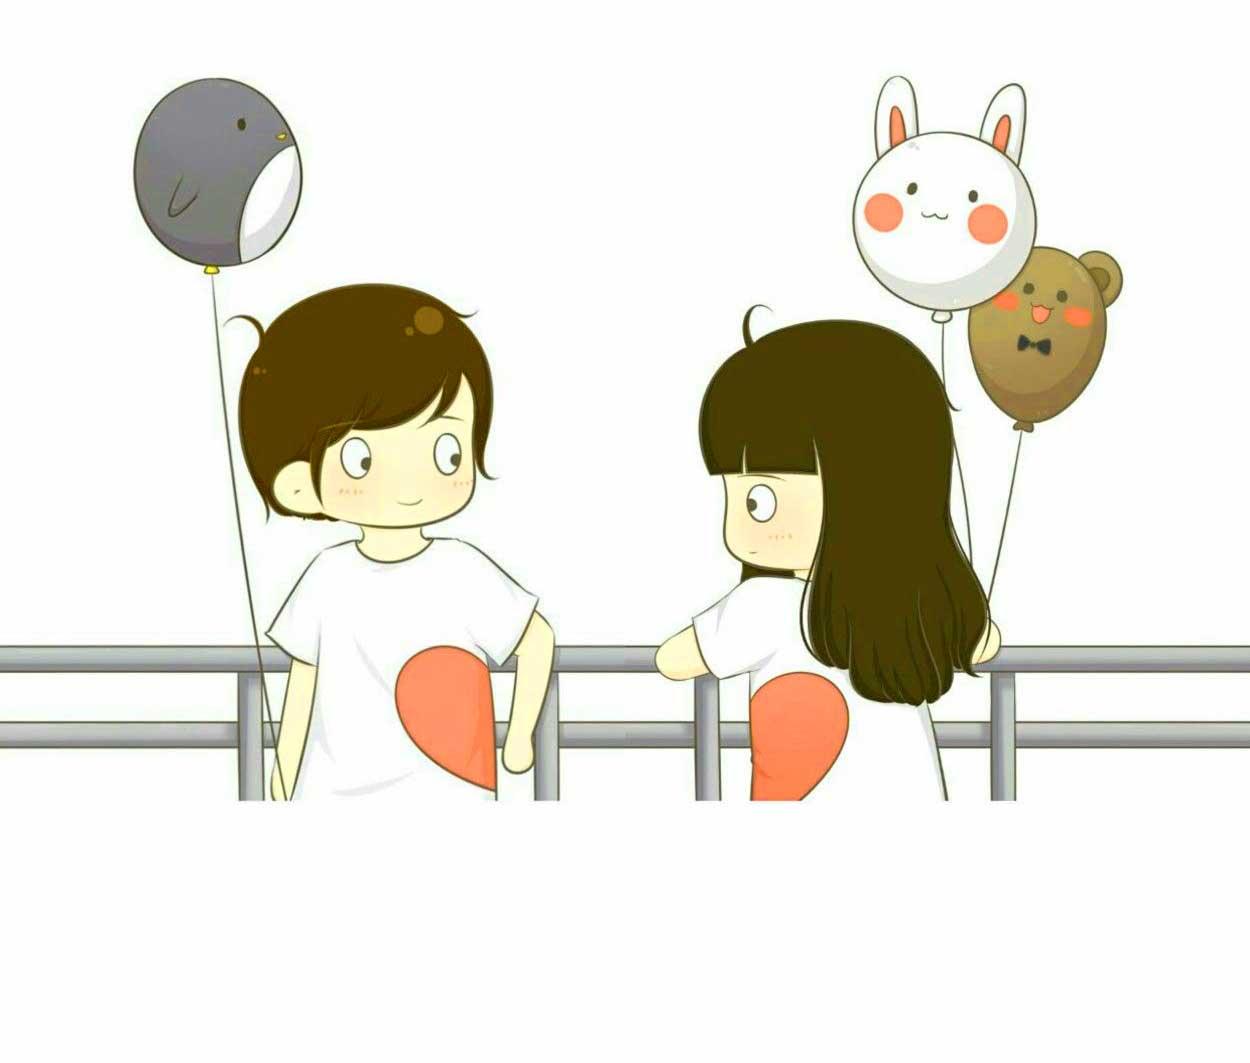 Free Love Couple Cartoon Nice Whatsapp Dp Images Pics Download